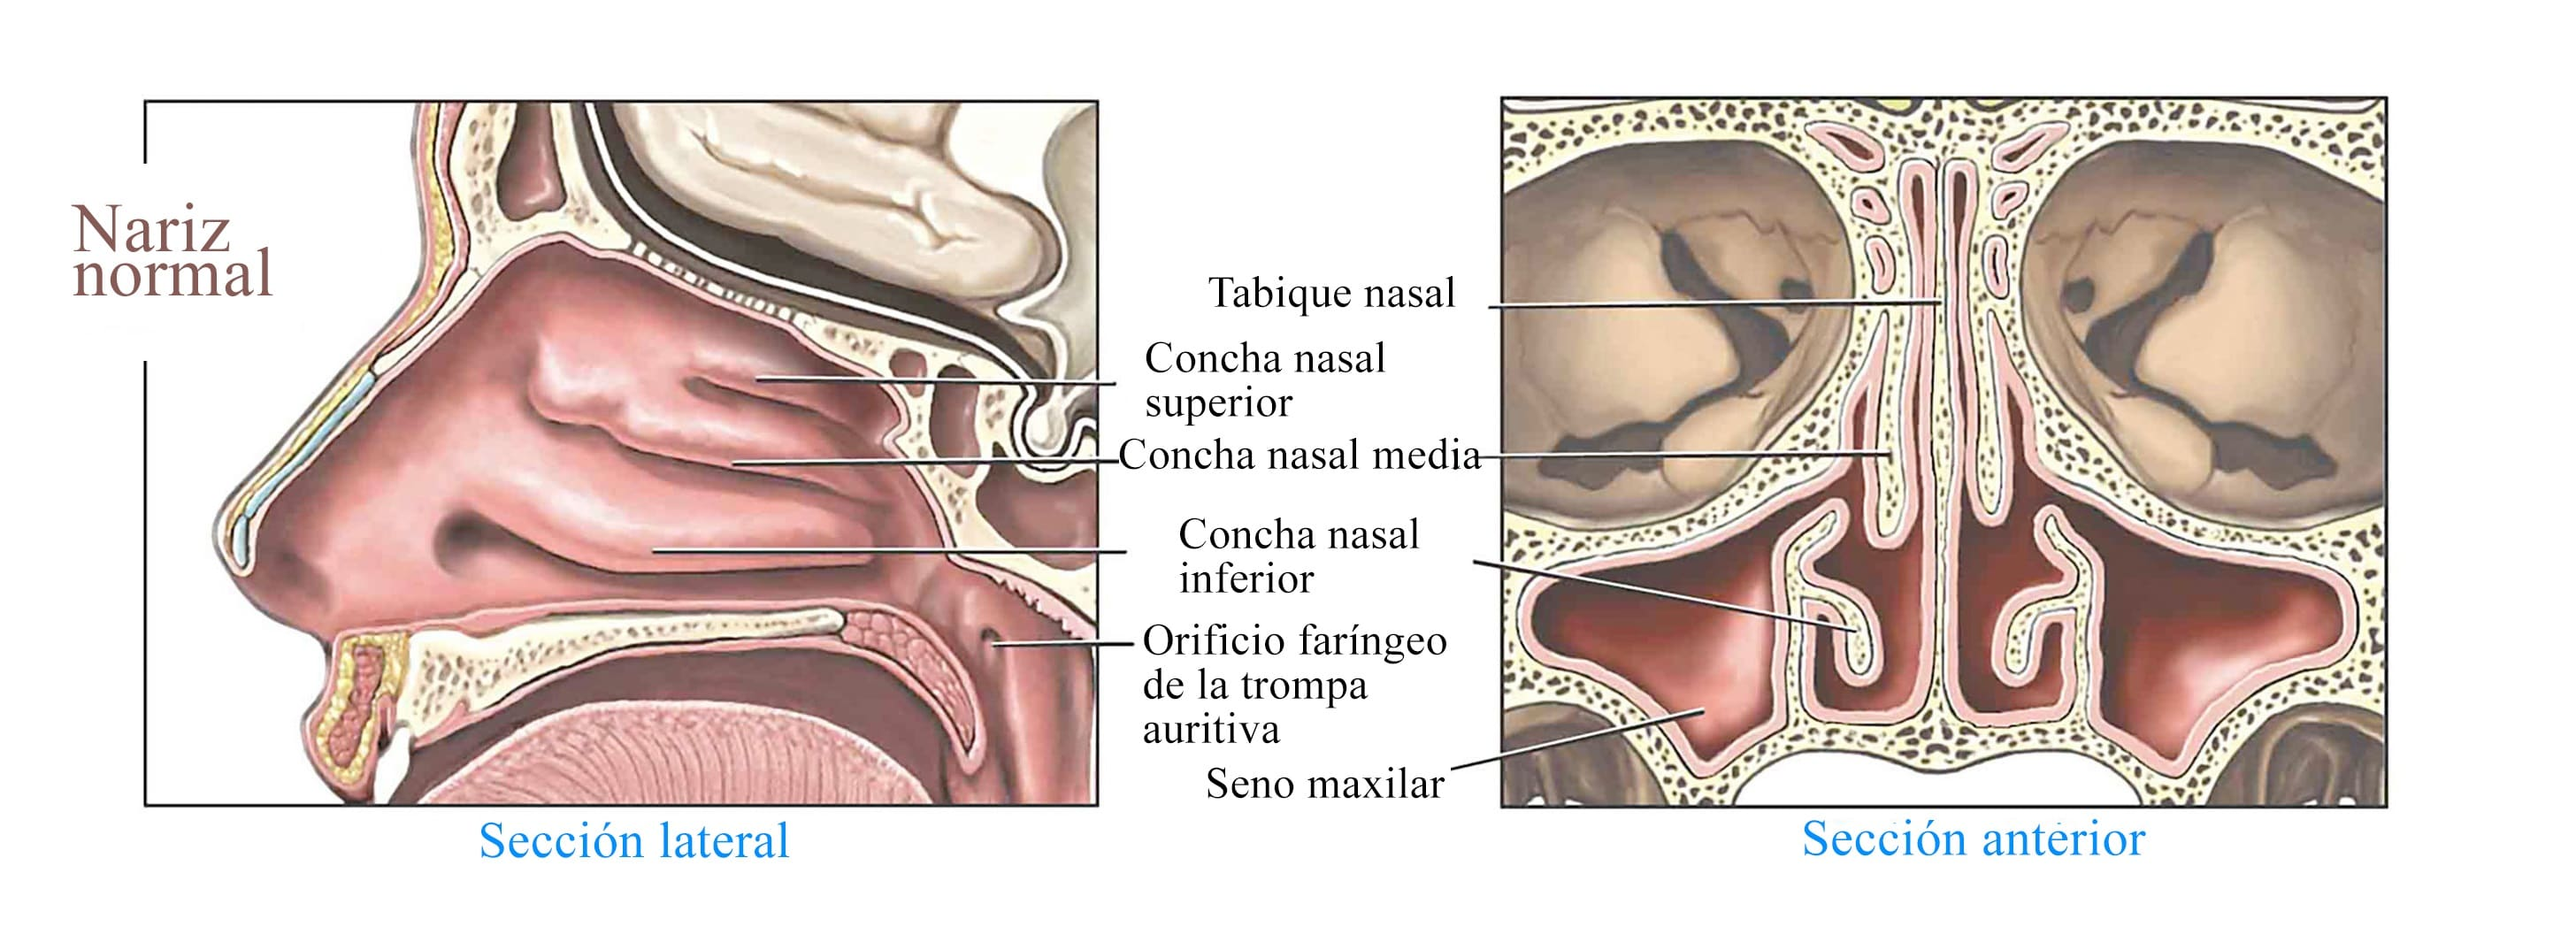 nariz-normal-cornetes